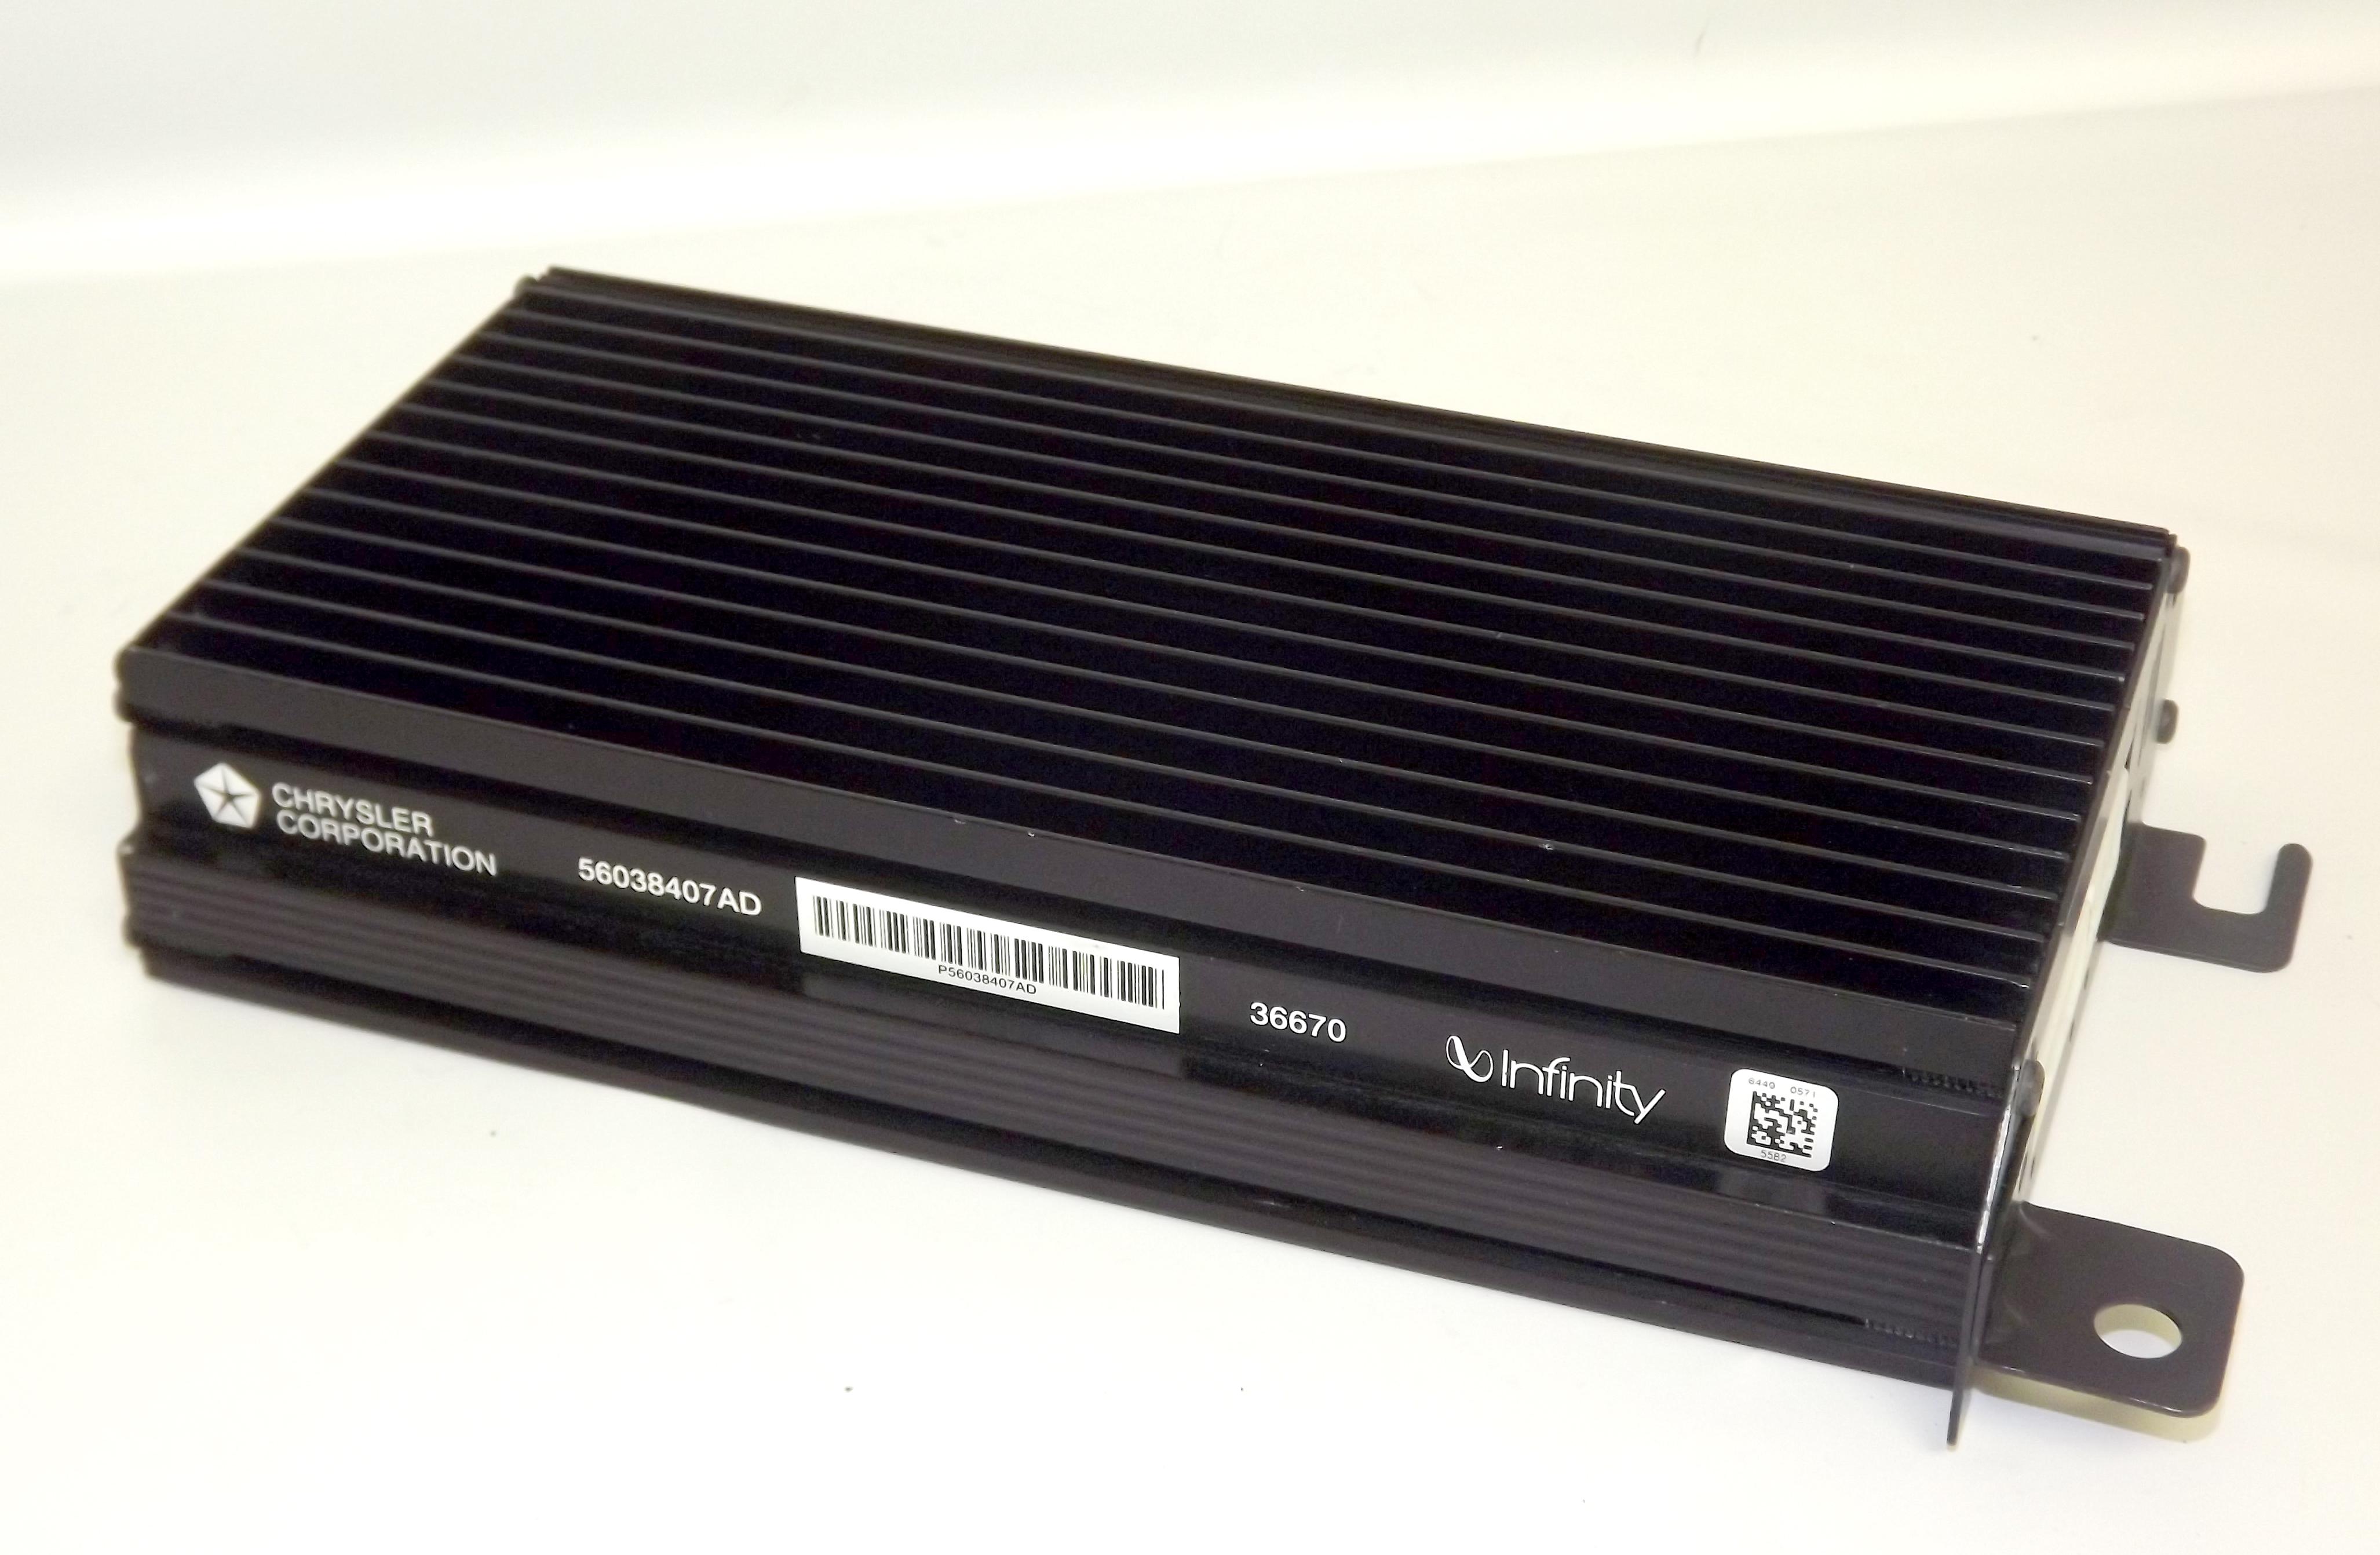 infinity amplifier. jeep grand cherokee infinity amp amplifier 1999-2002 oem chrysler pn 56038407ad - 1 factory radio